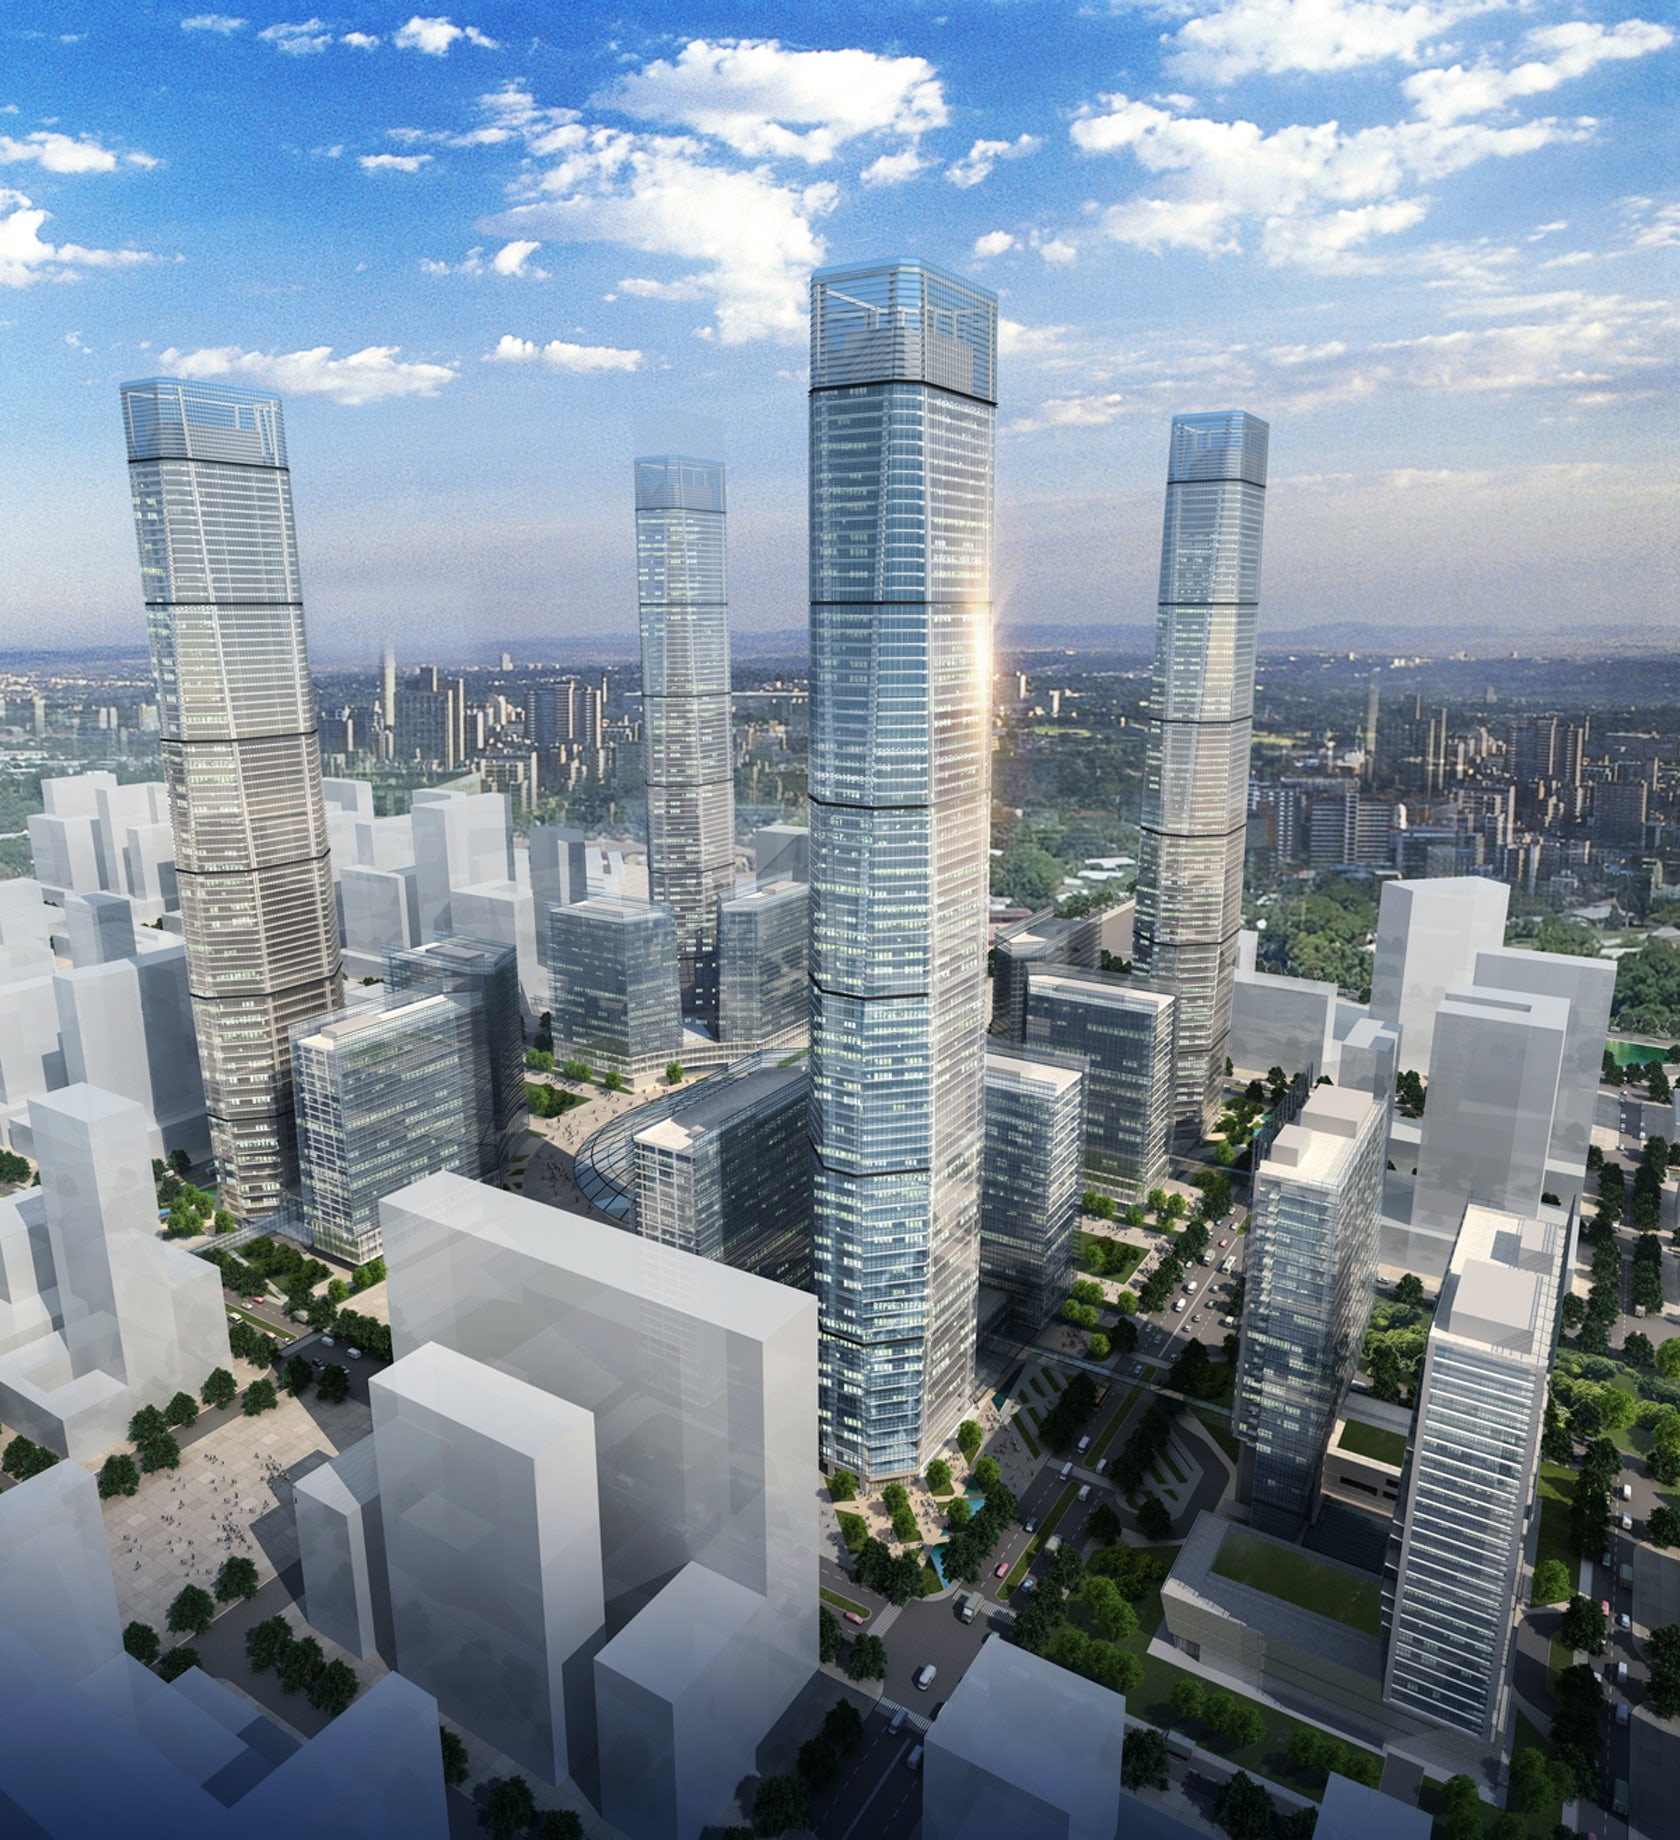 City Center: Changchun Southern New City Center